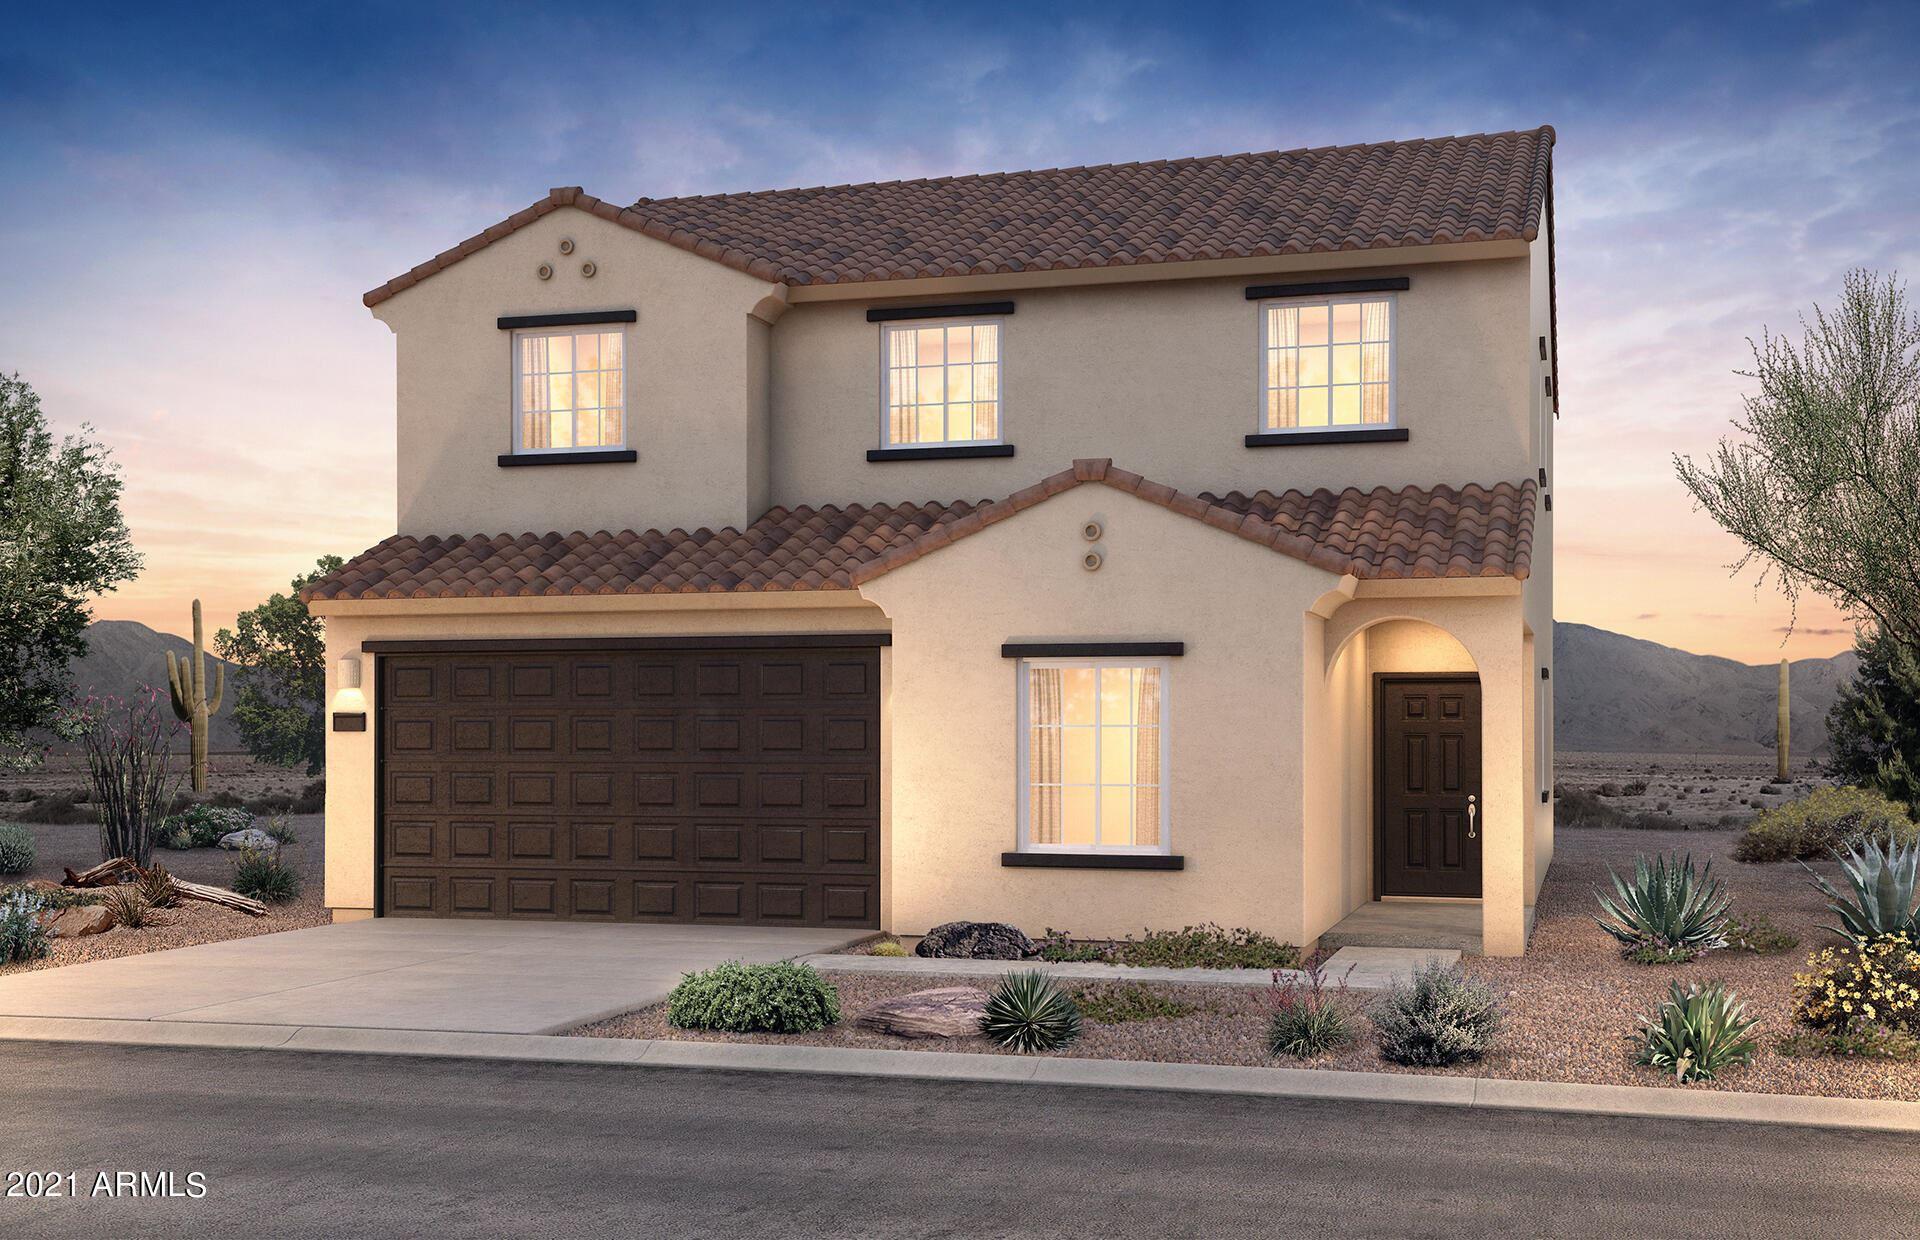 Photo for 43657 W ACACIA Avenue, Maricopa, AZ 85138 (MLS # 6290547)